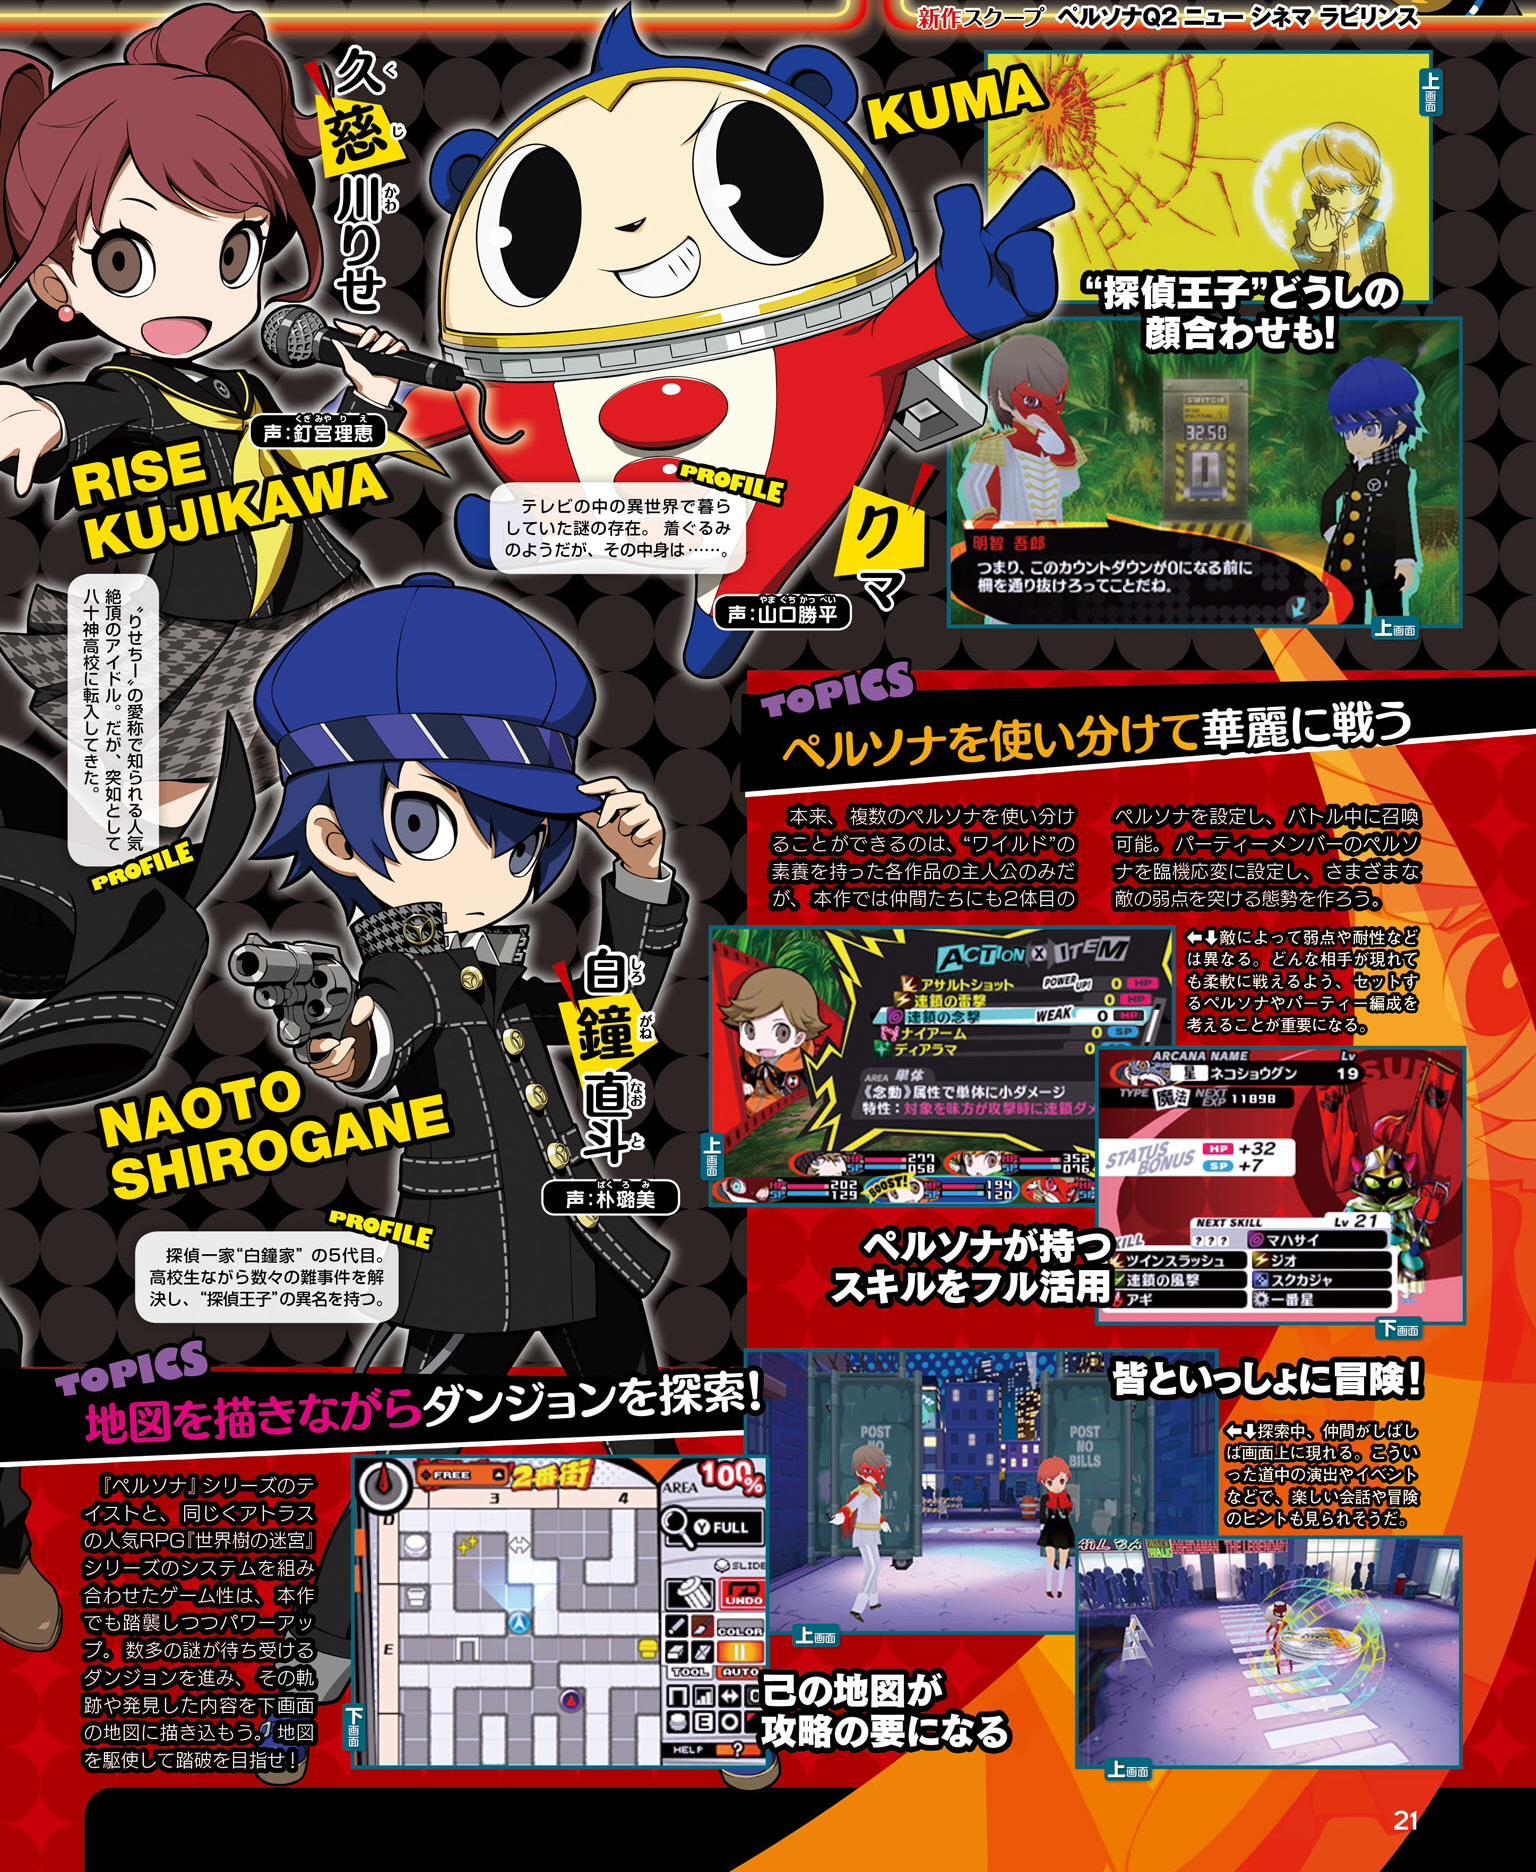 Warriors Orochi 4 Pc Download: Persona Q2, Warriors Orochi 4, Work X Work